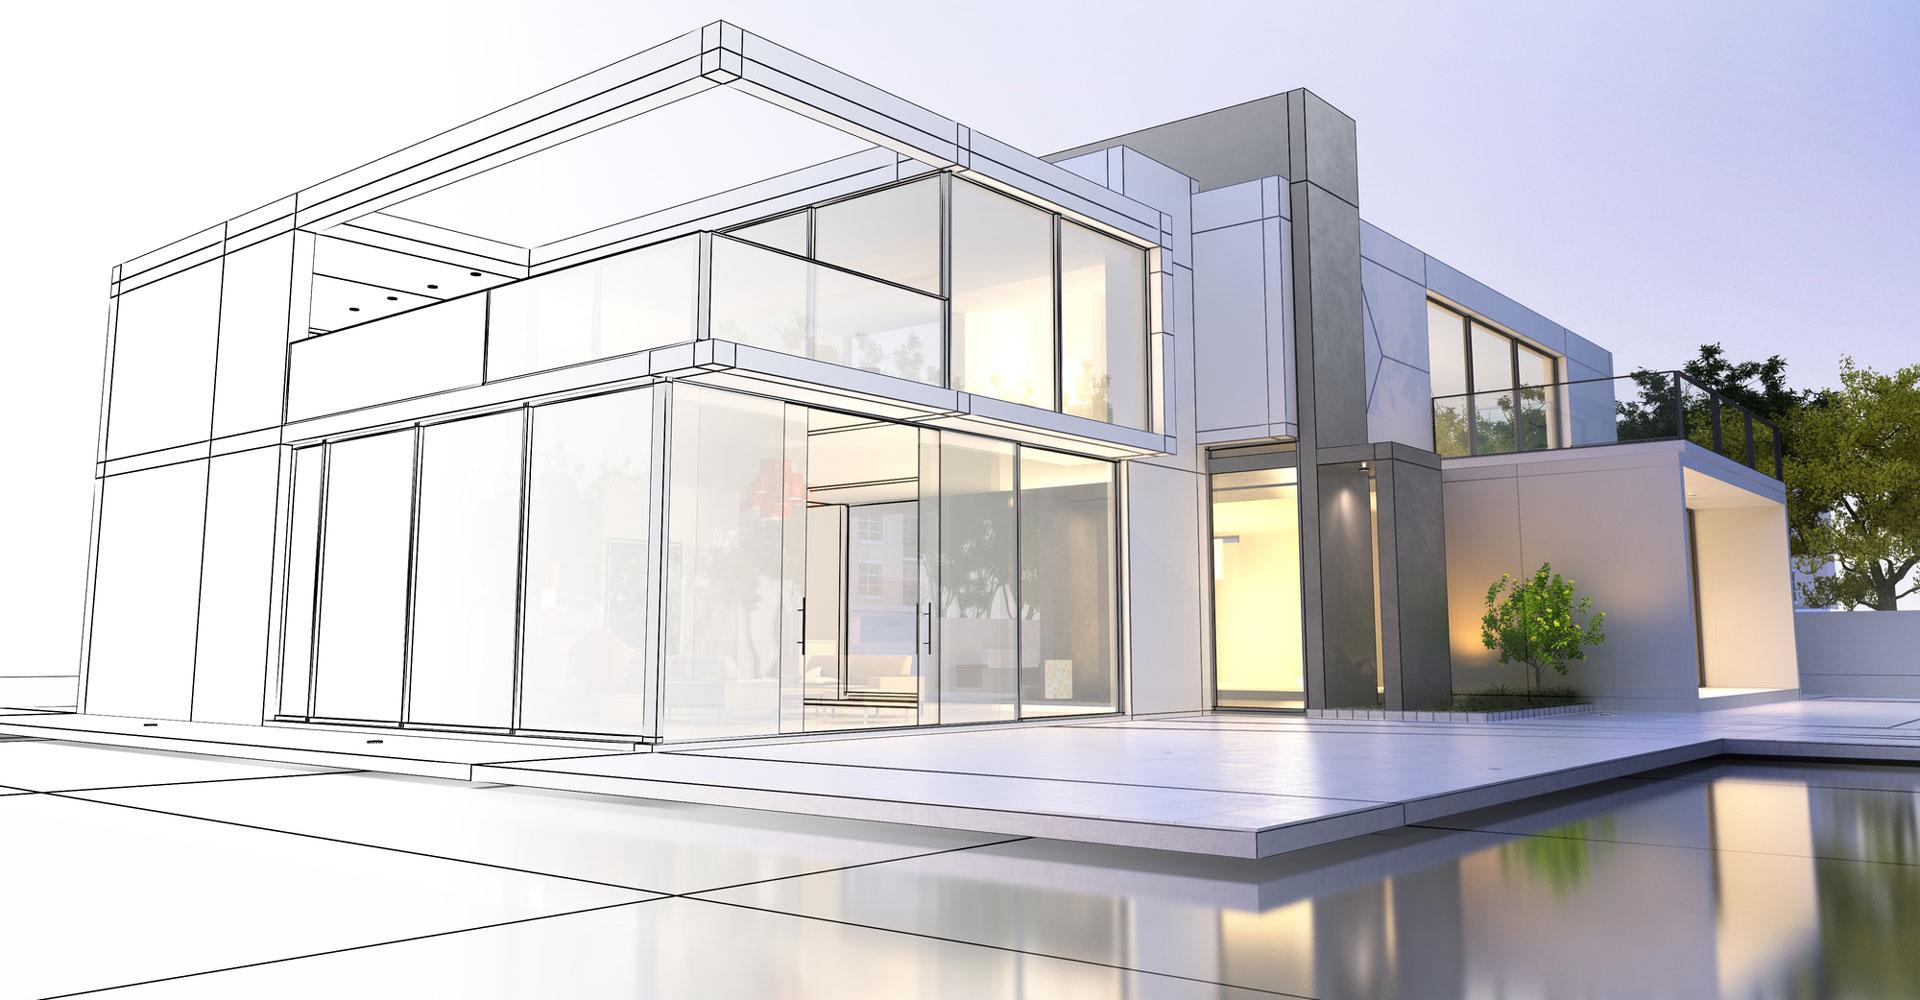 Kelowna Home Builders - Home Page Image3.1